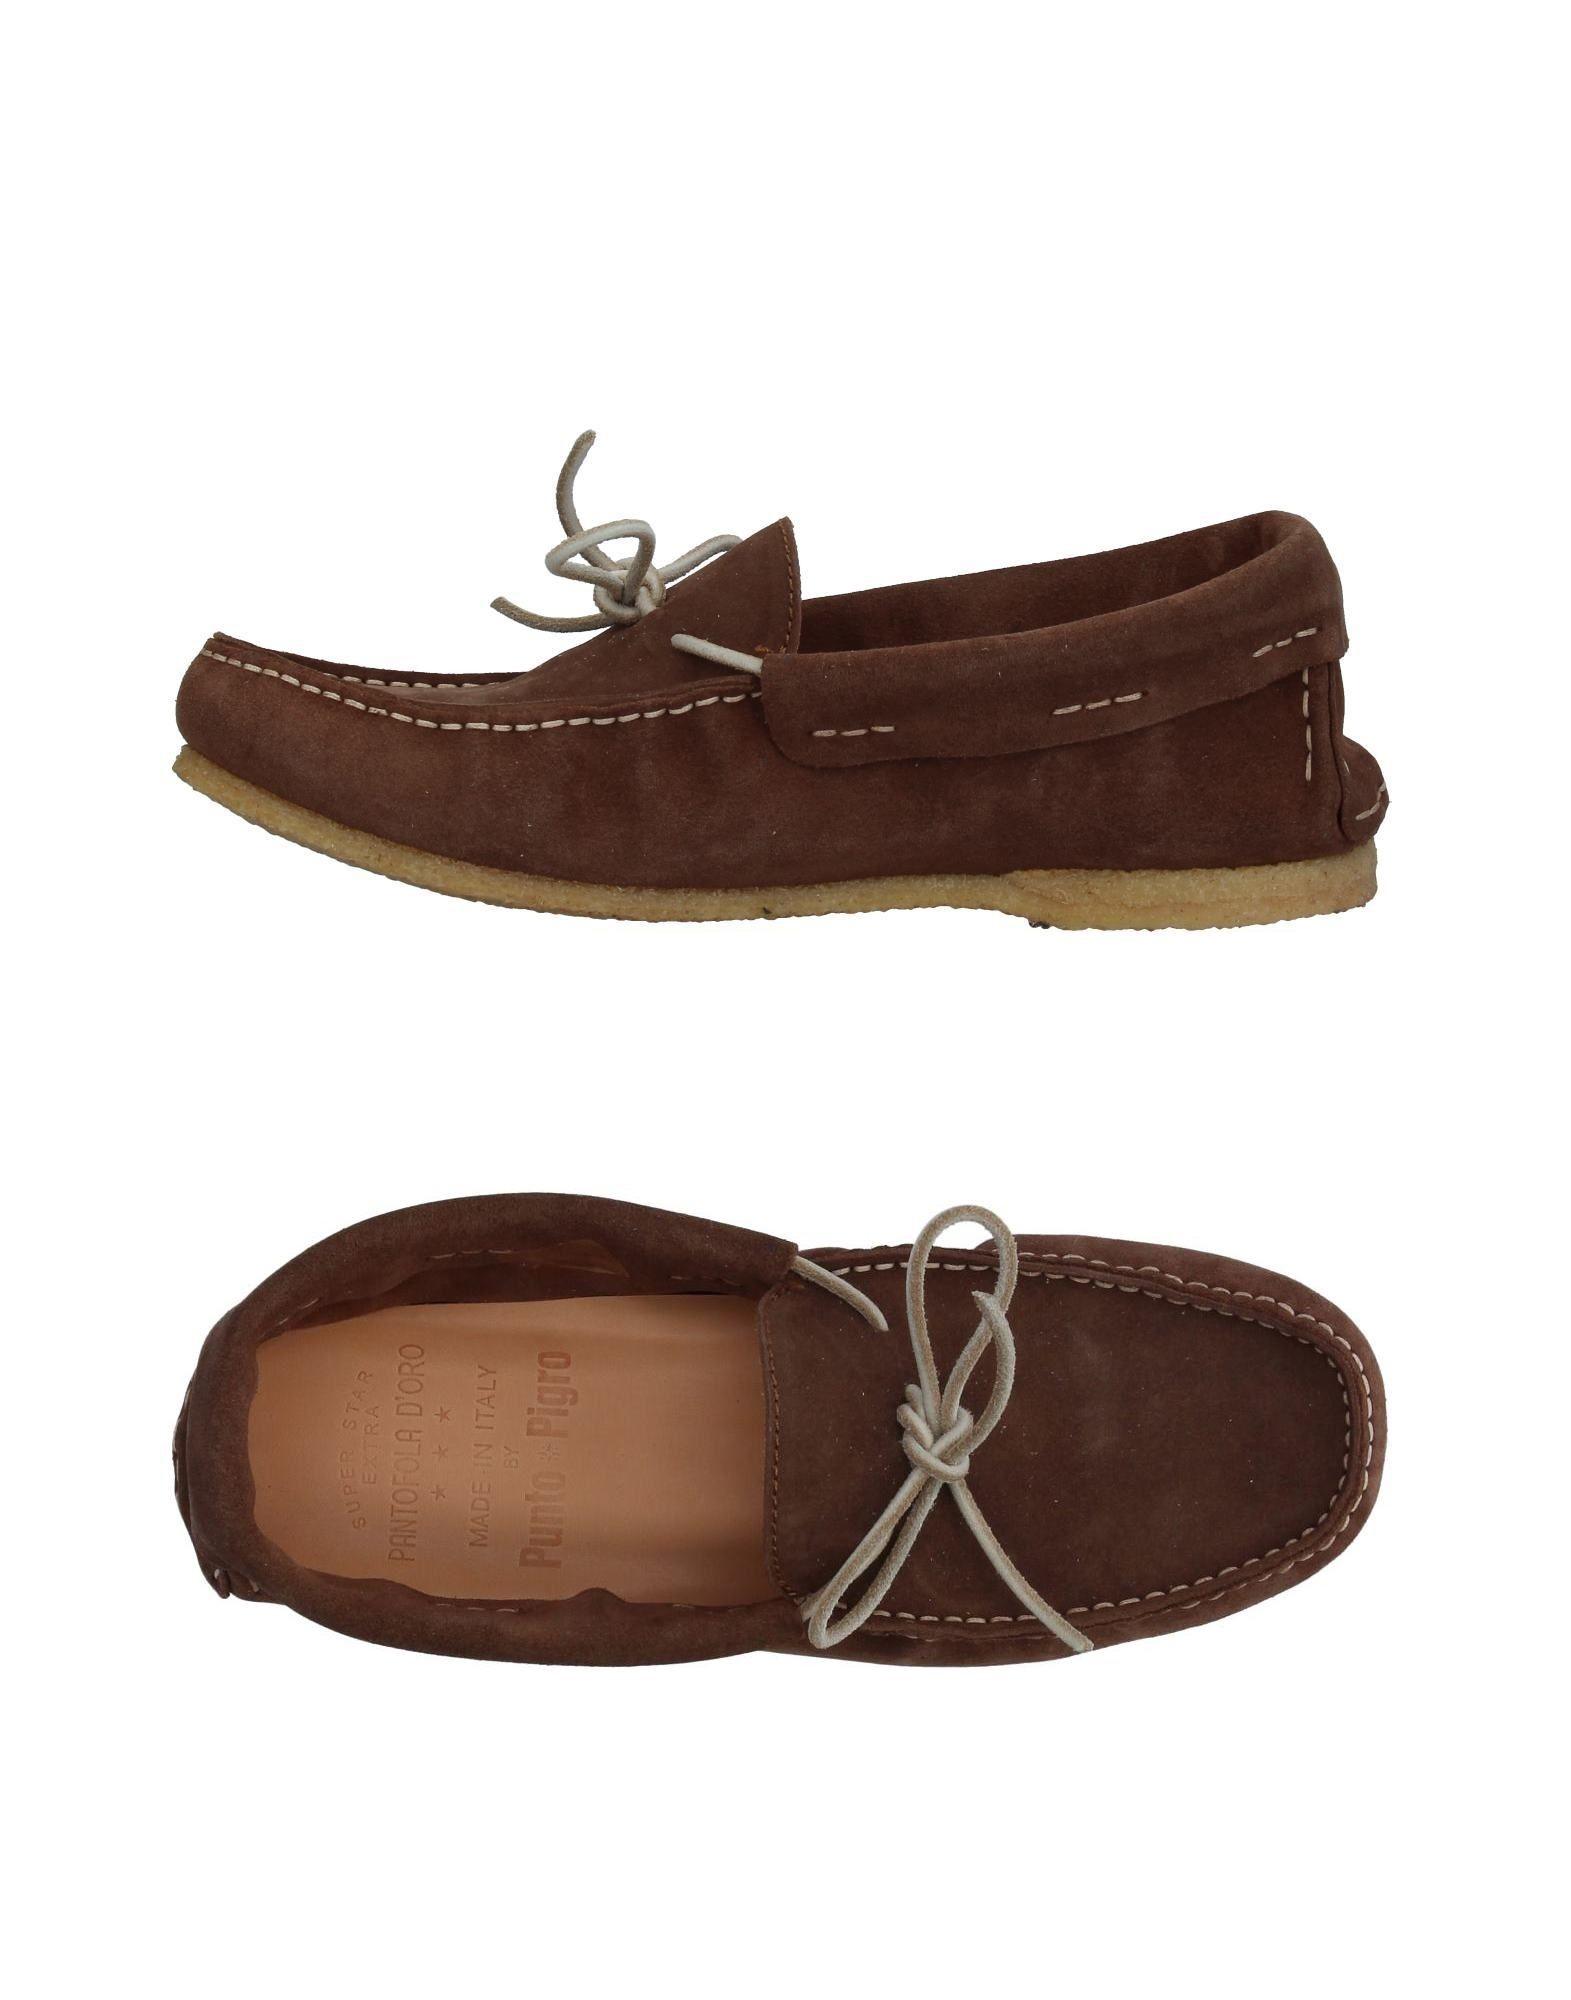 ФОТО pantofola d'oro мокасины